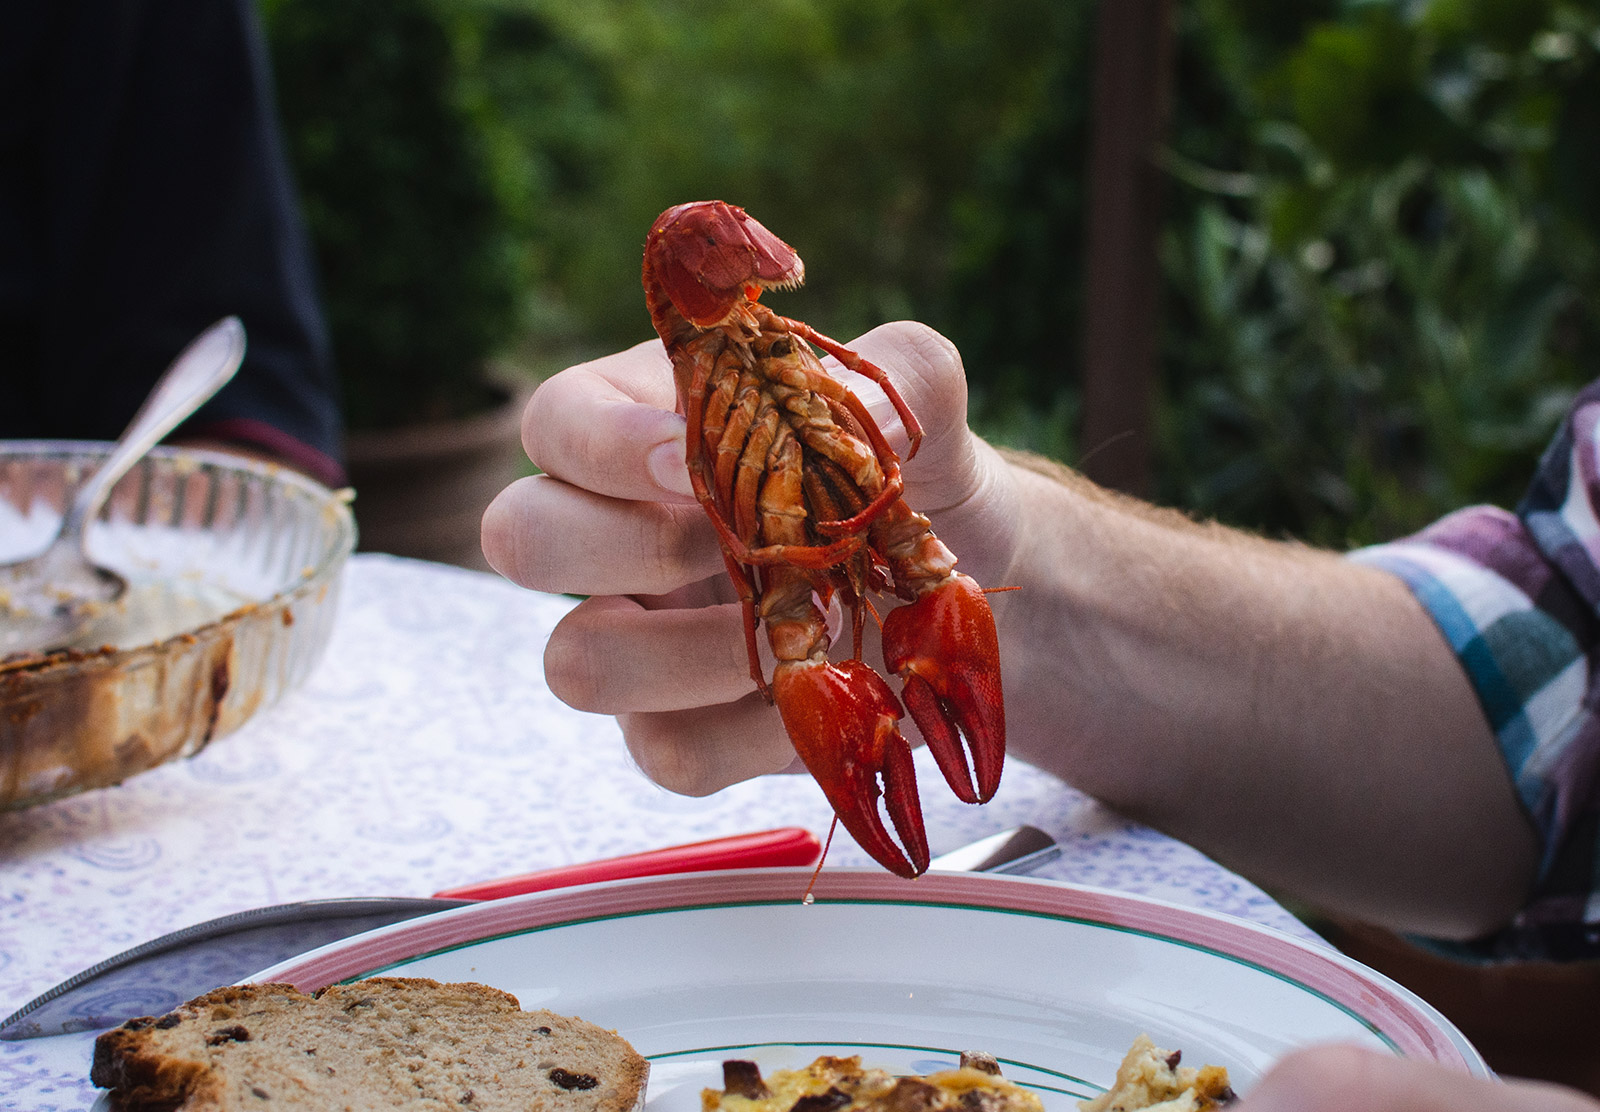 Crayfish belly